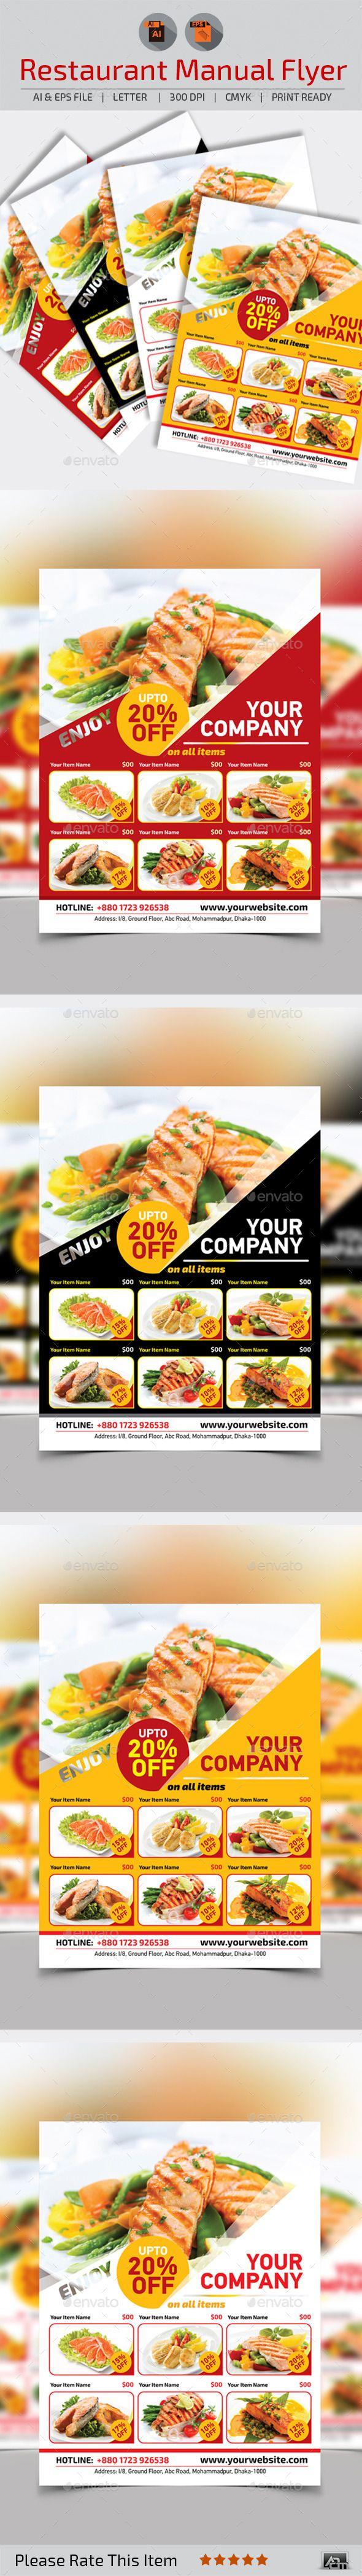 Restaurant Food Menu Template - Restaurant Flyers